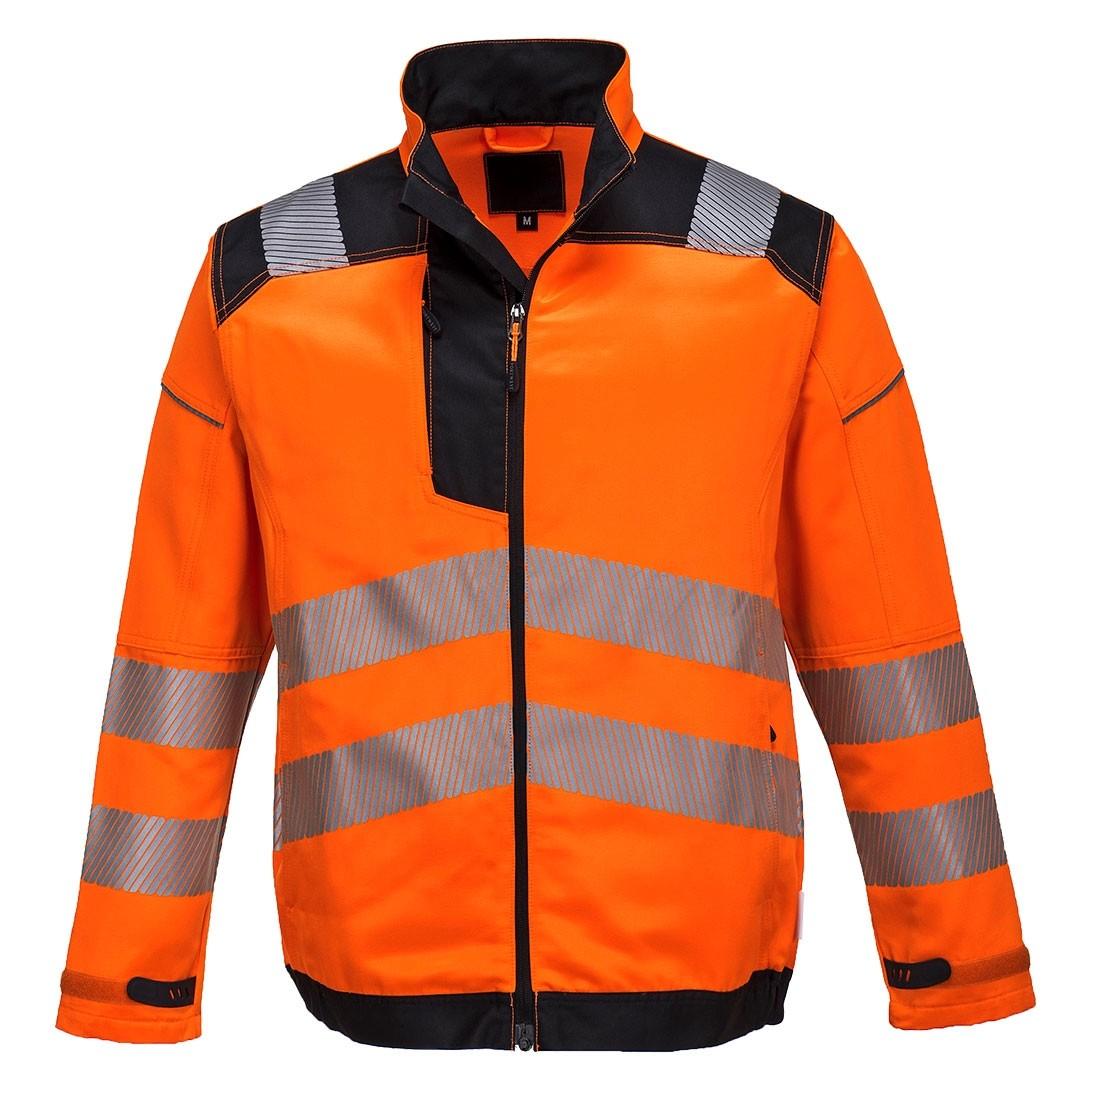 Vision Hi-Vis Takki, oranssi